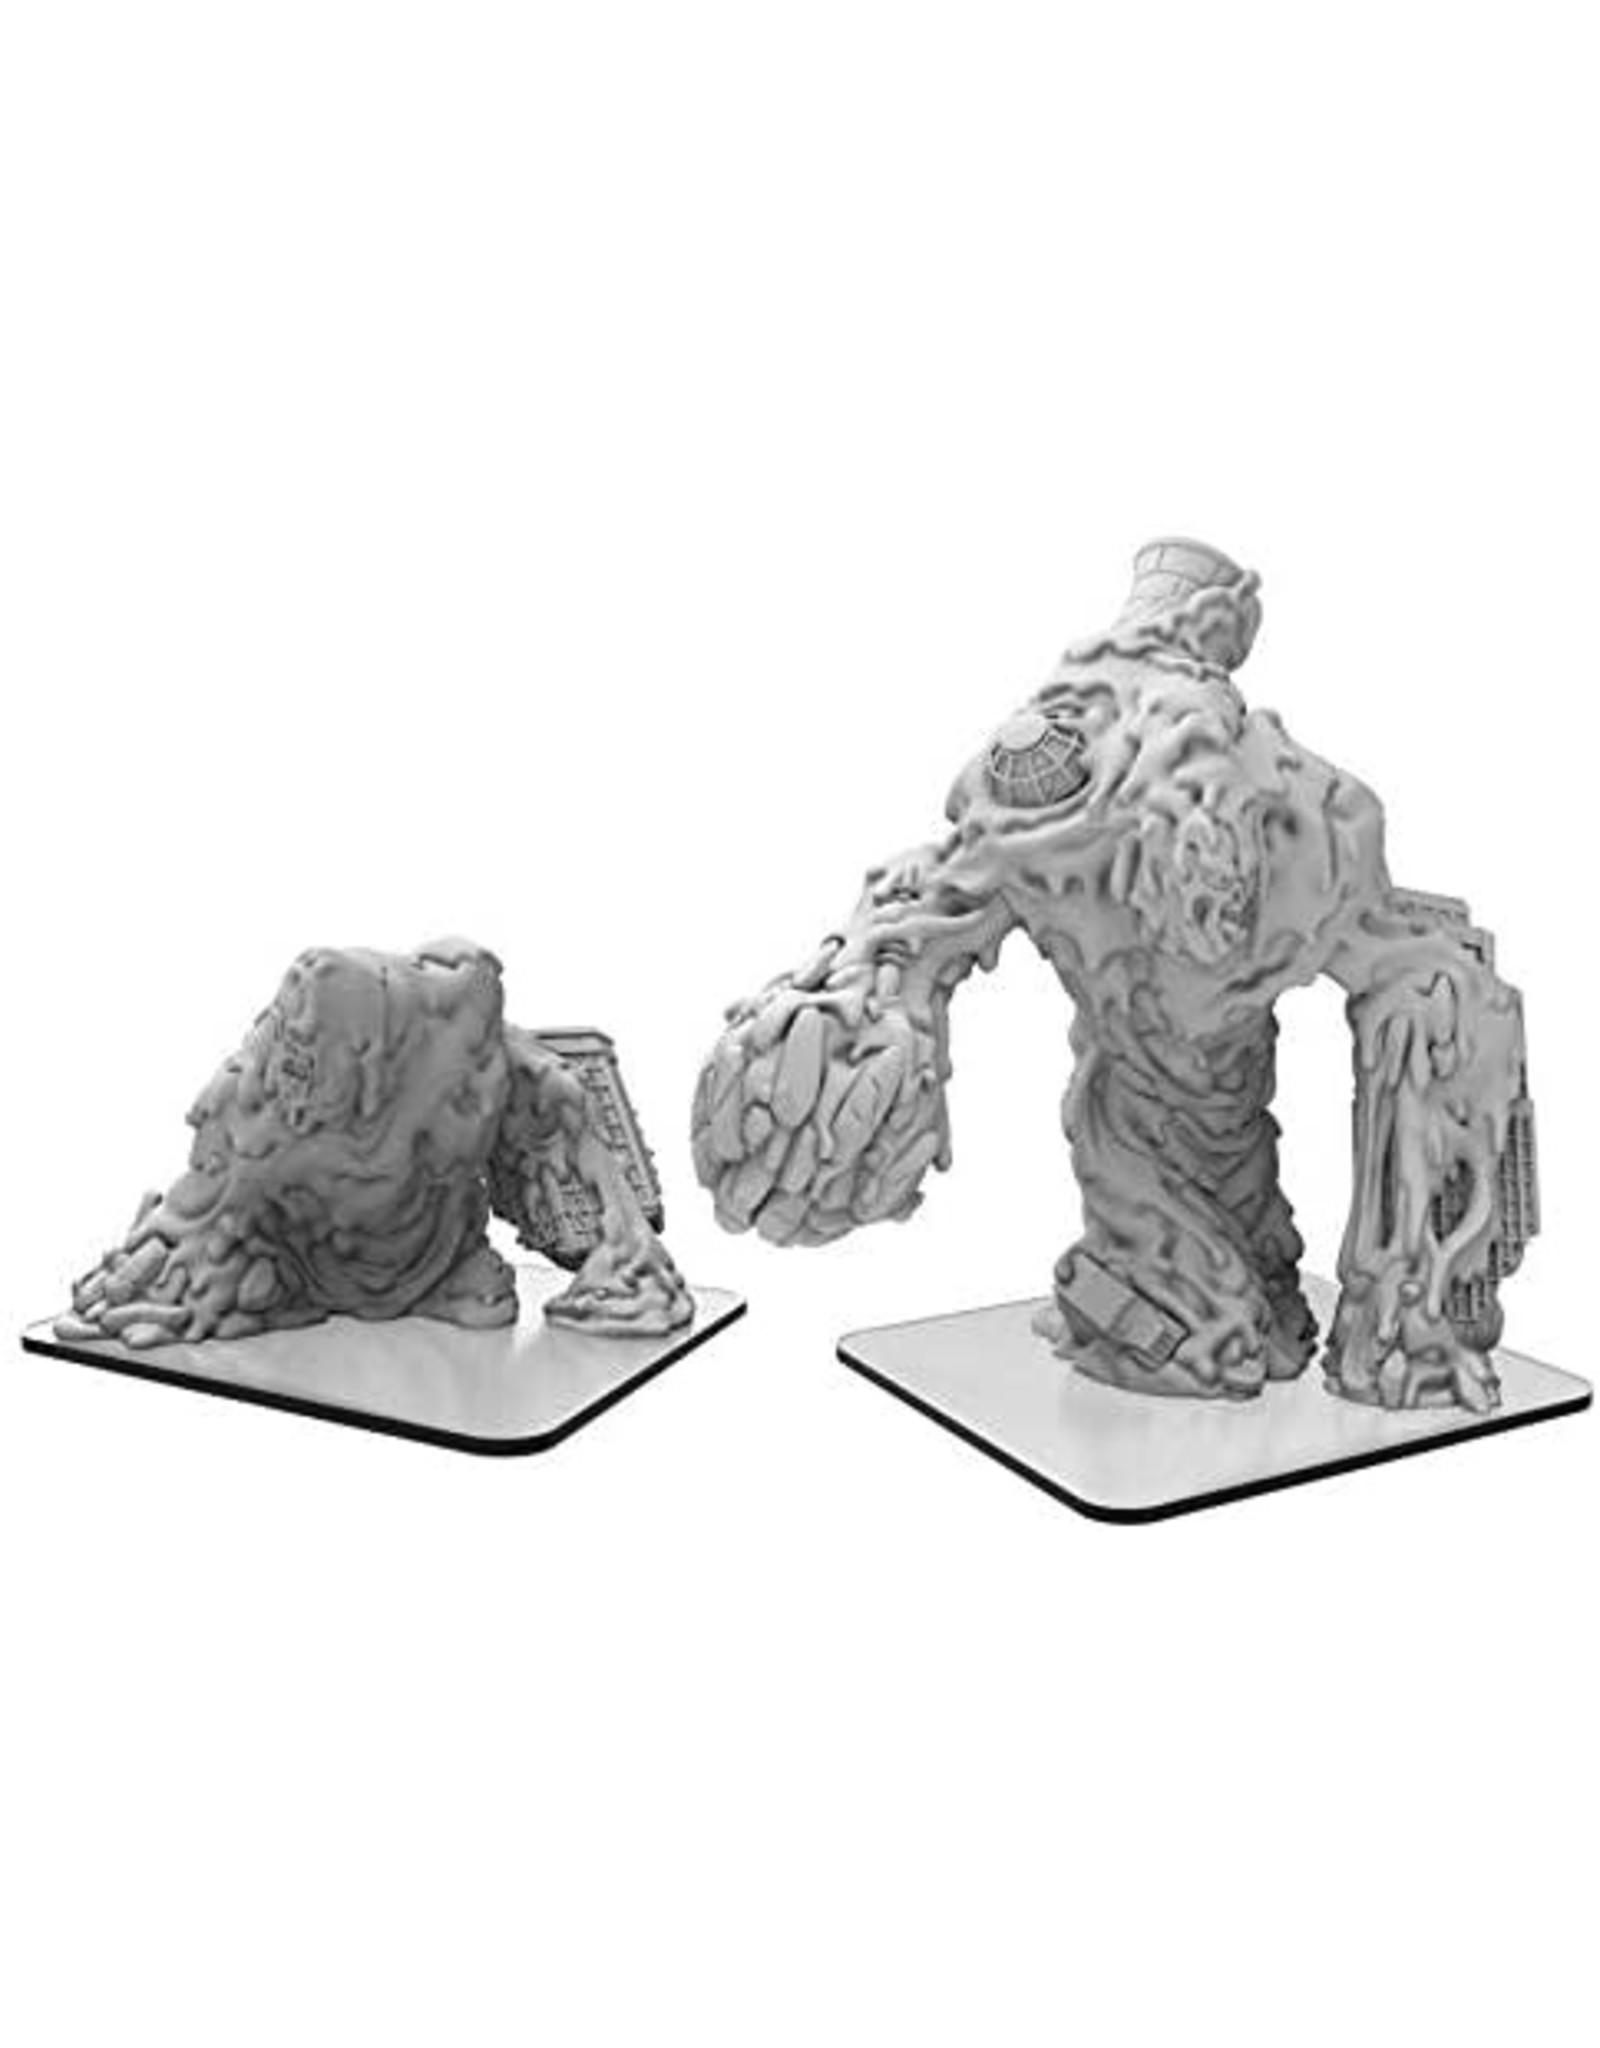 Privateer Press Monsterpocalypse: Globbicus – Waste Monster (metal/resin)